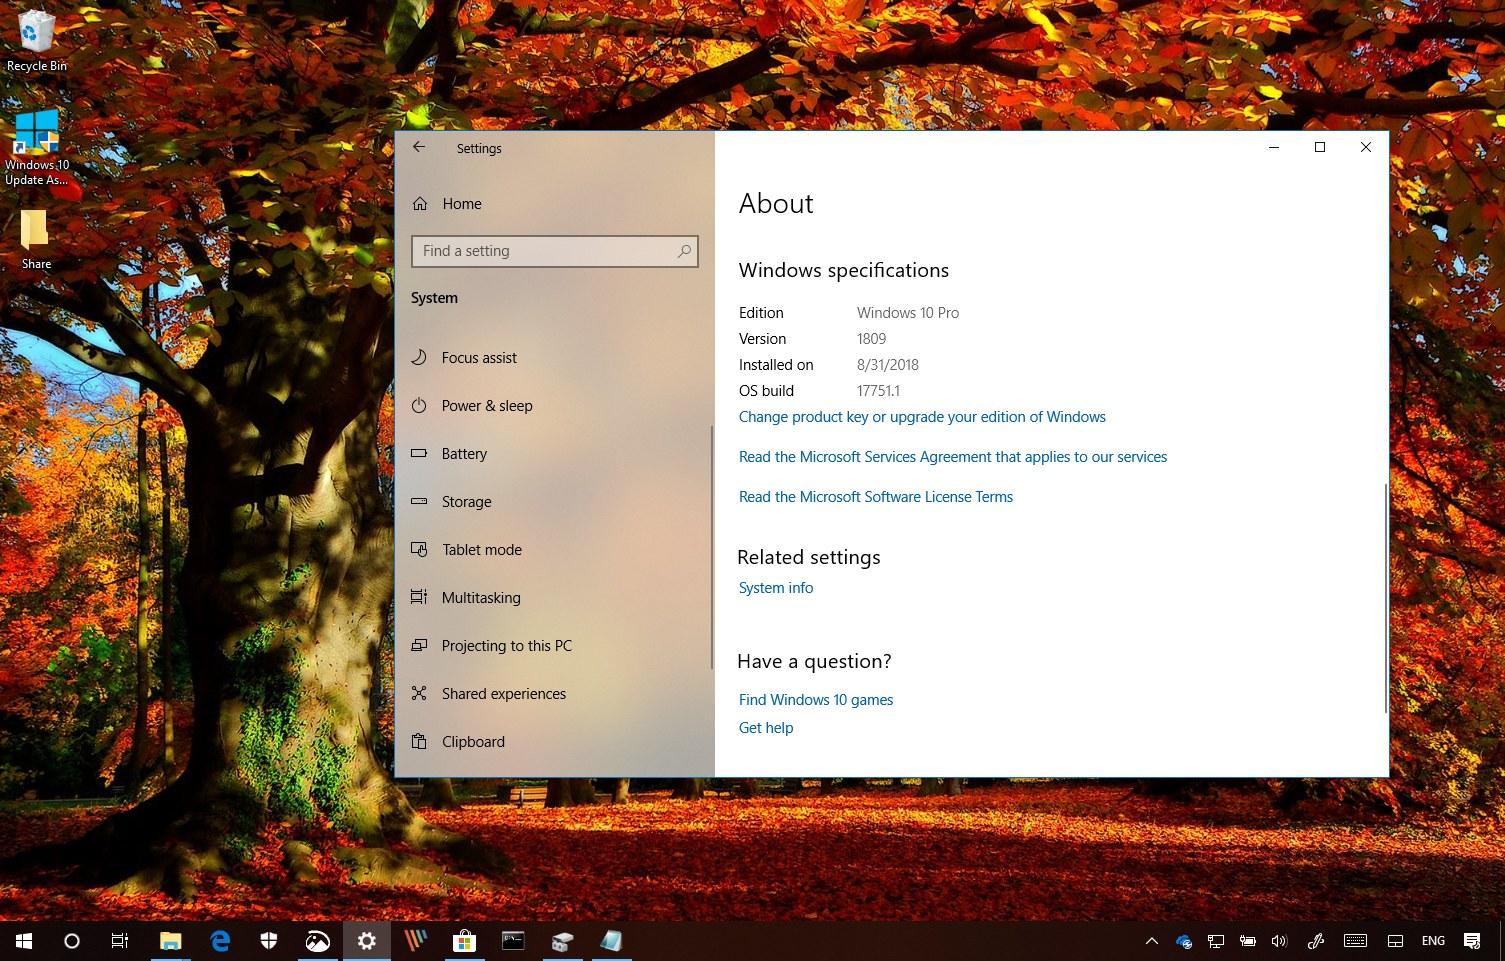 Windows 10 version 1809 release date